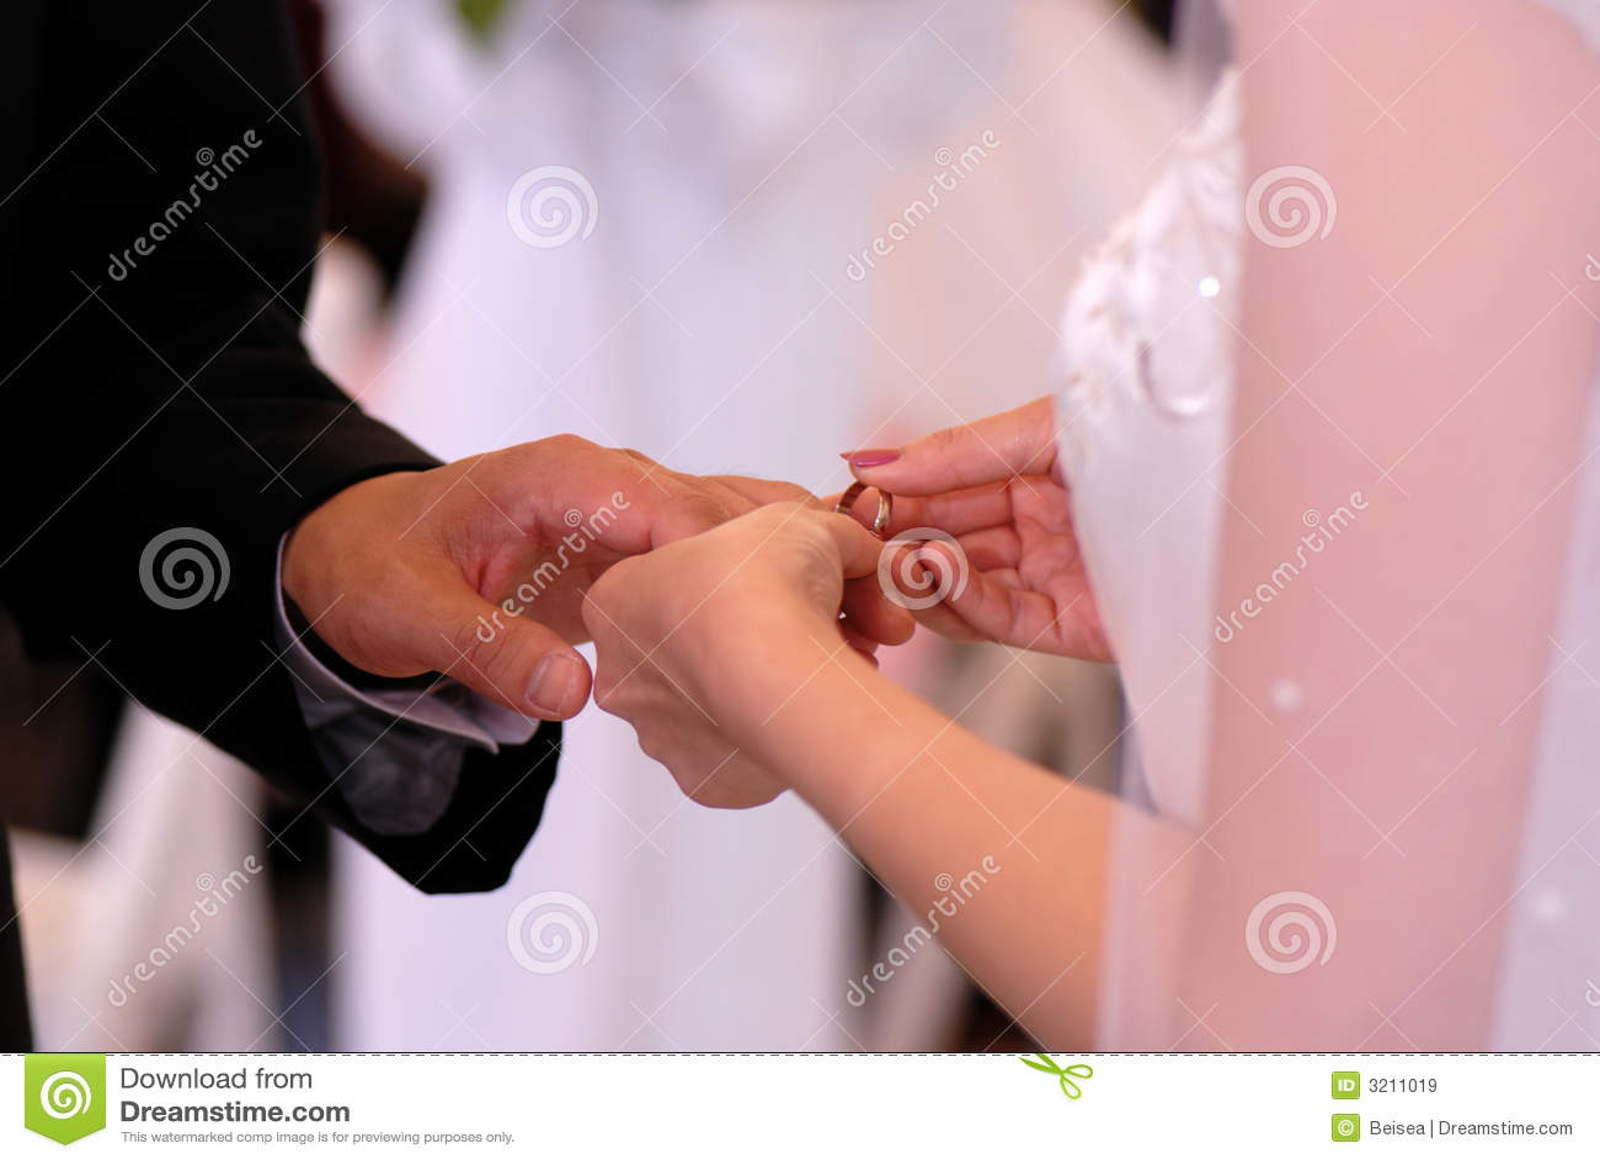 Wedding Ring Exchange stock image. Image of ceremony, diamond - 3211019